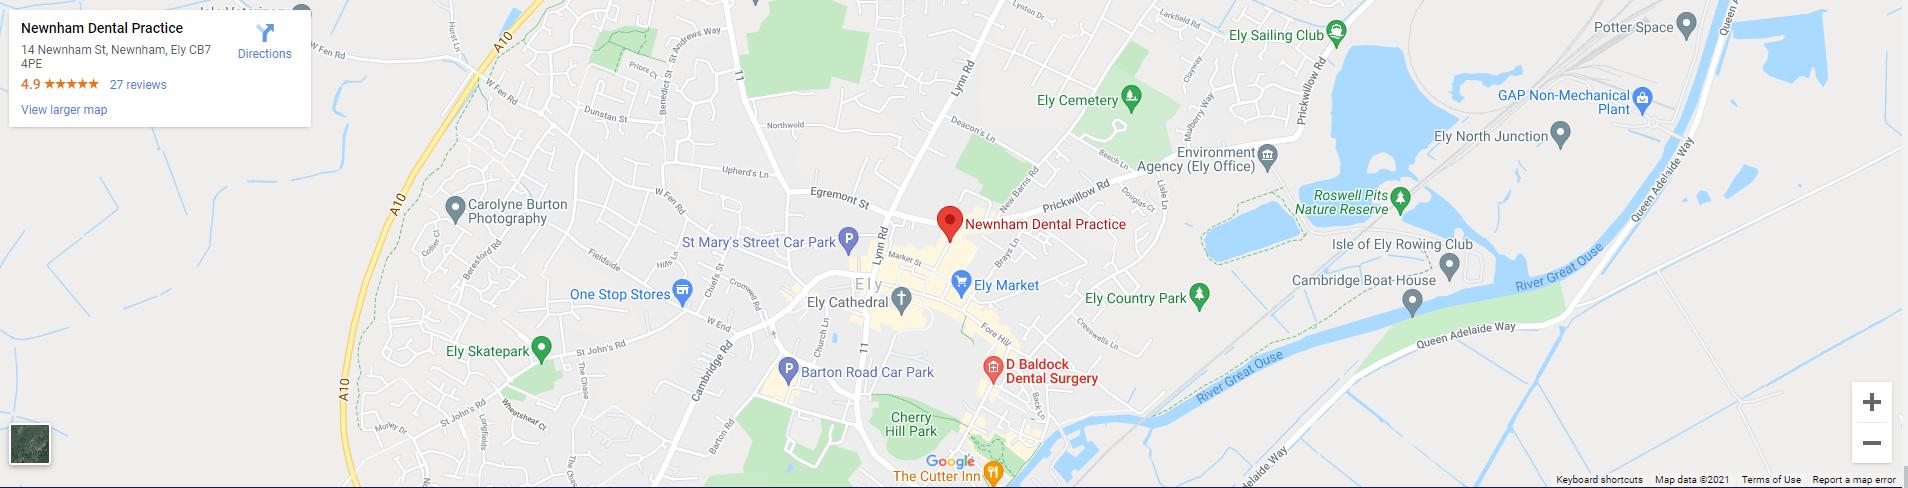 Newnham dental practice location